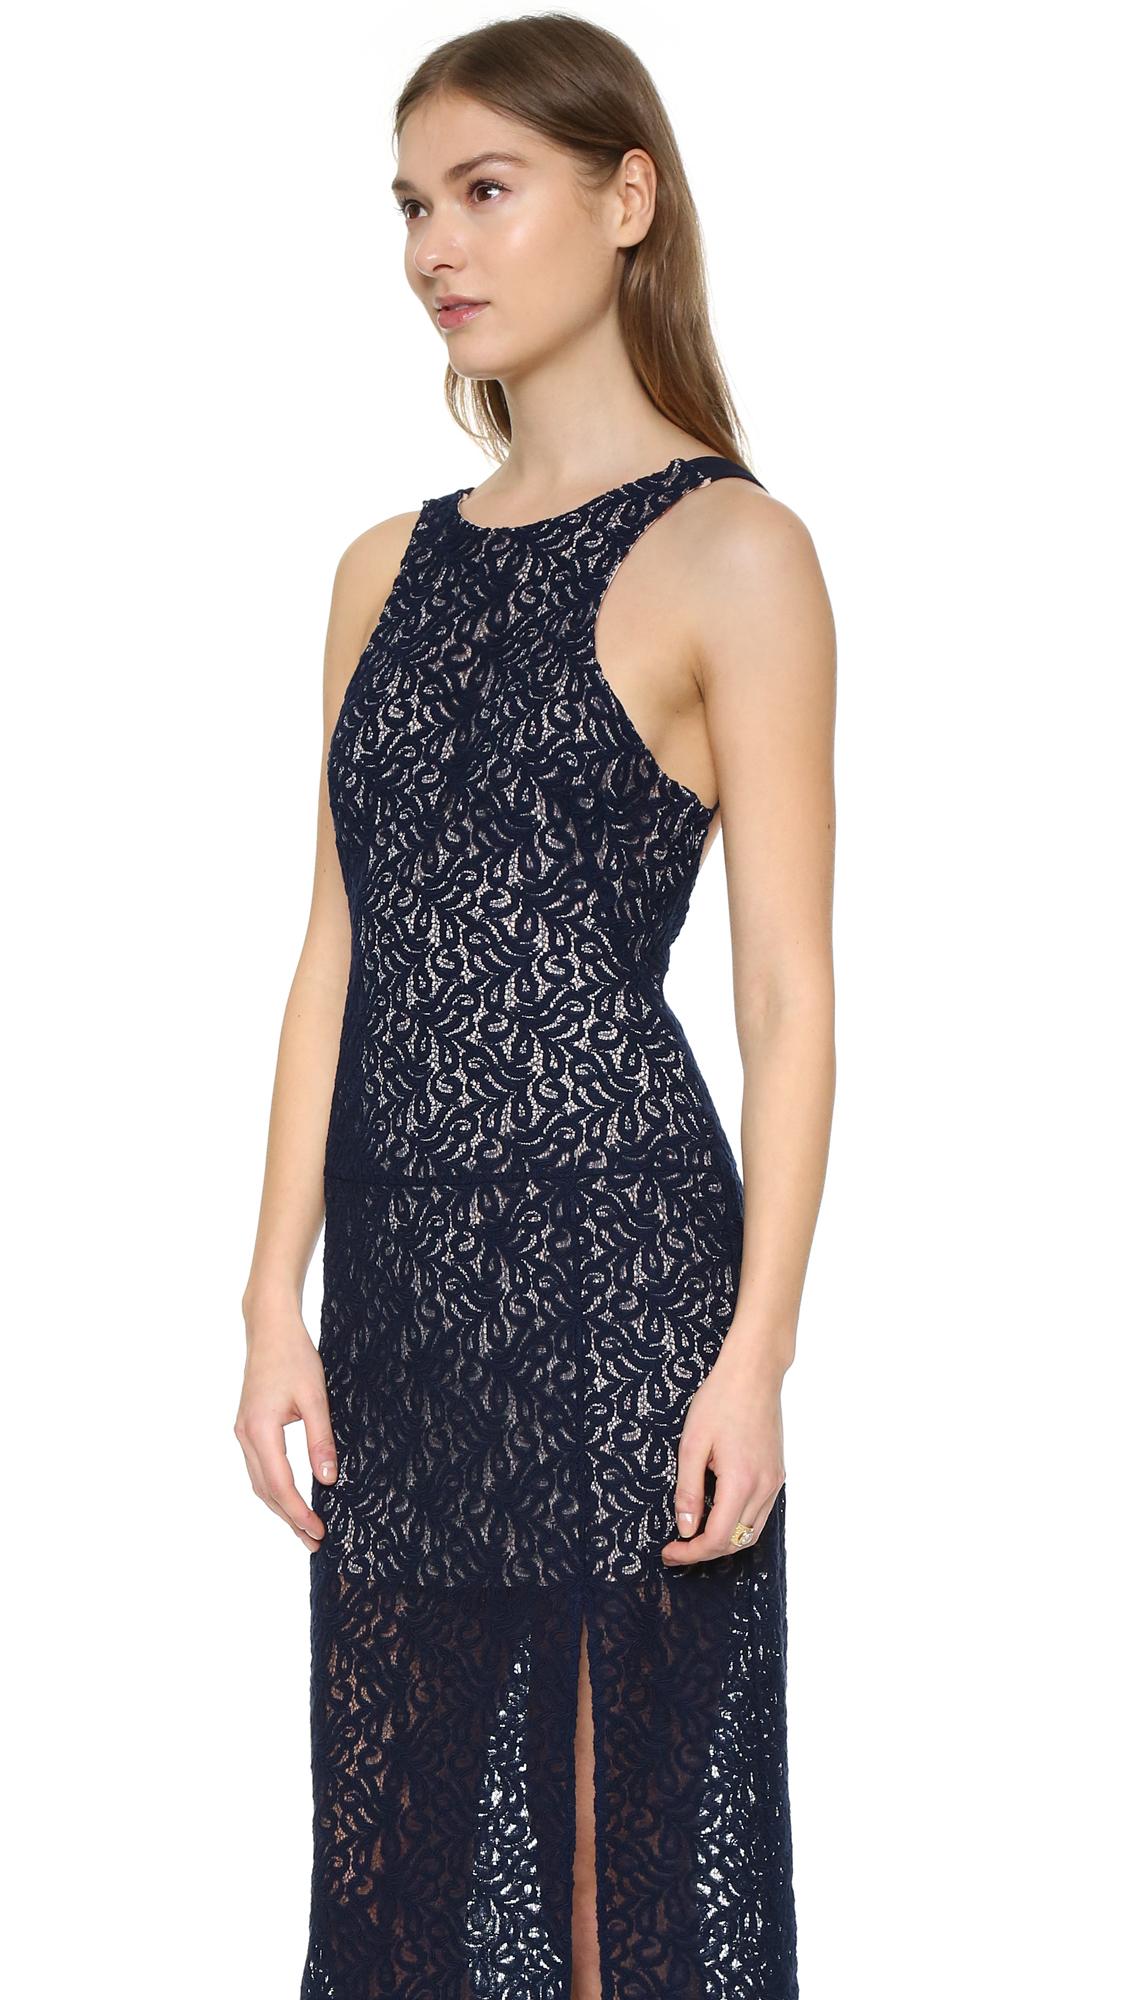 Indigo Lace Dresses